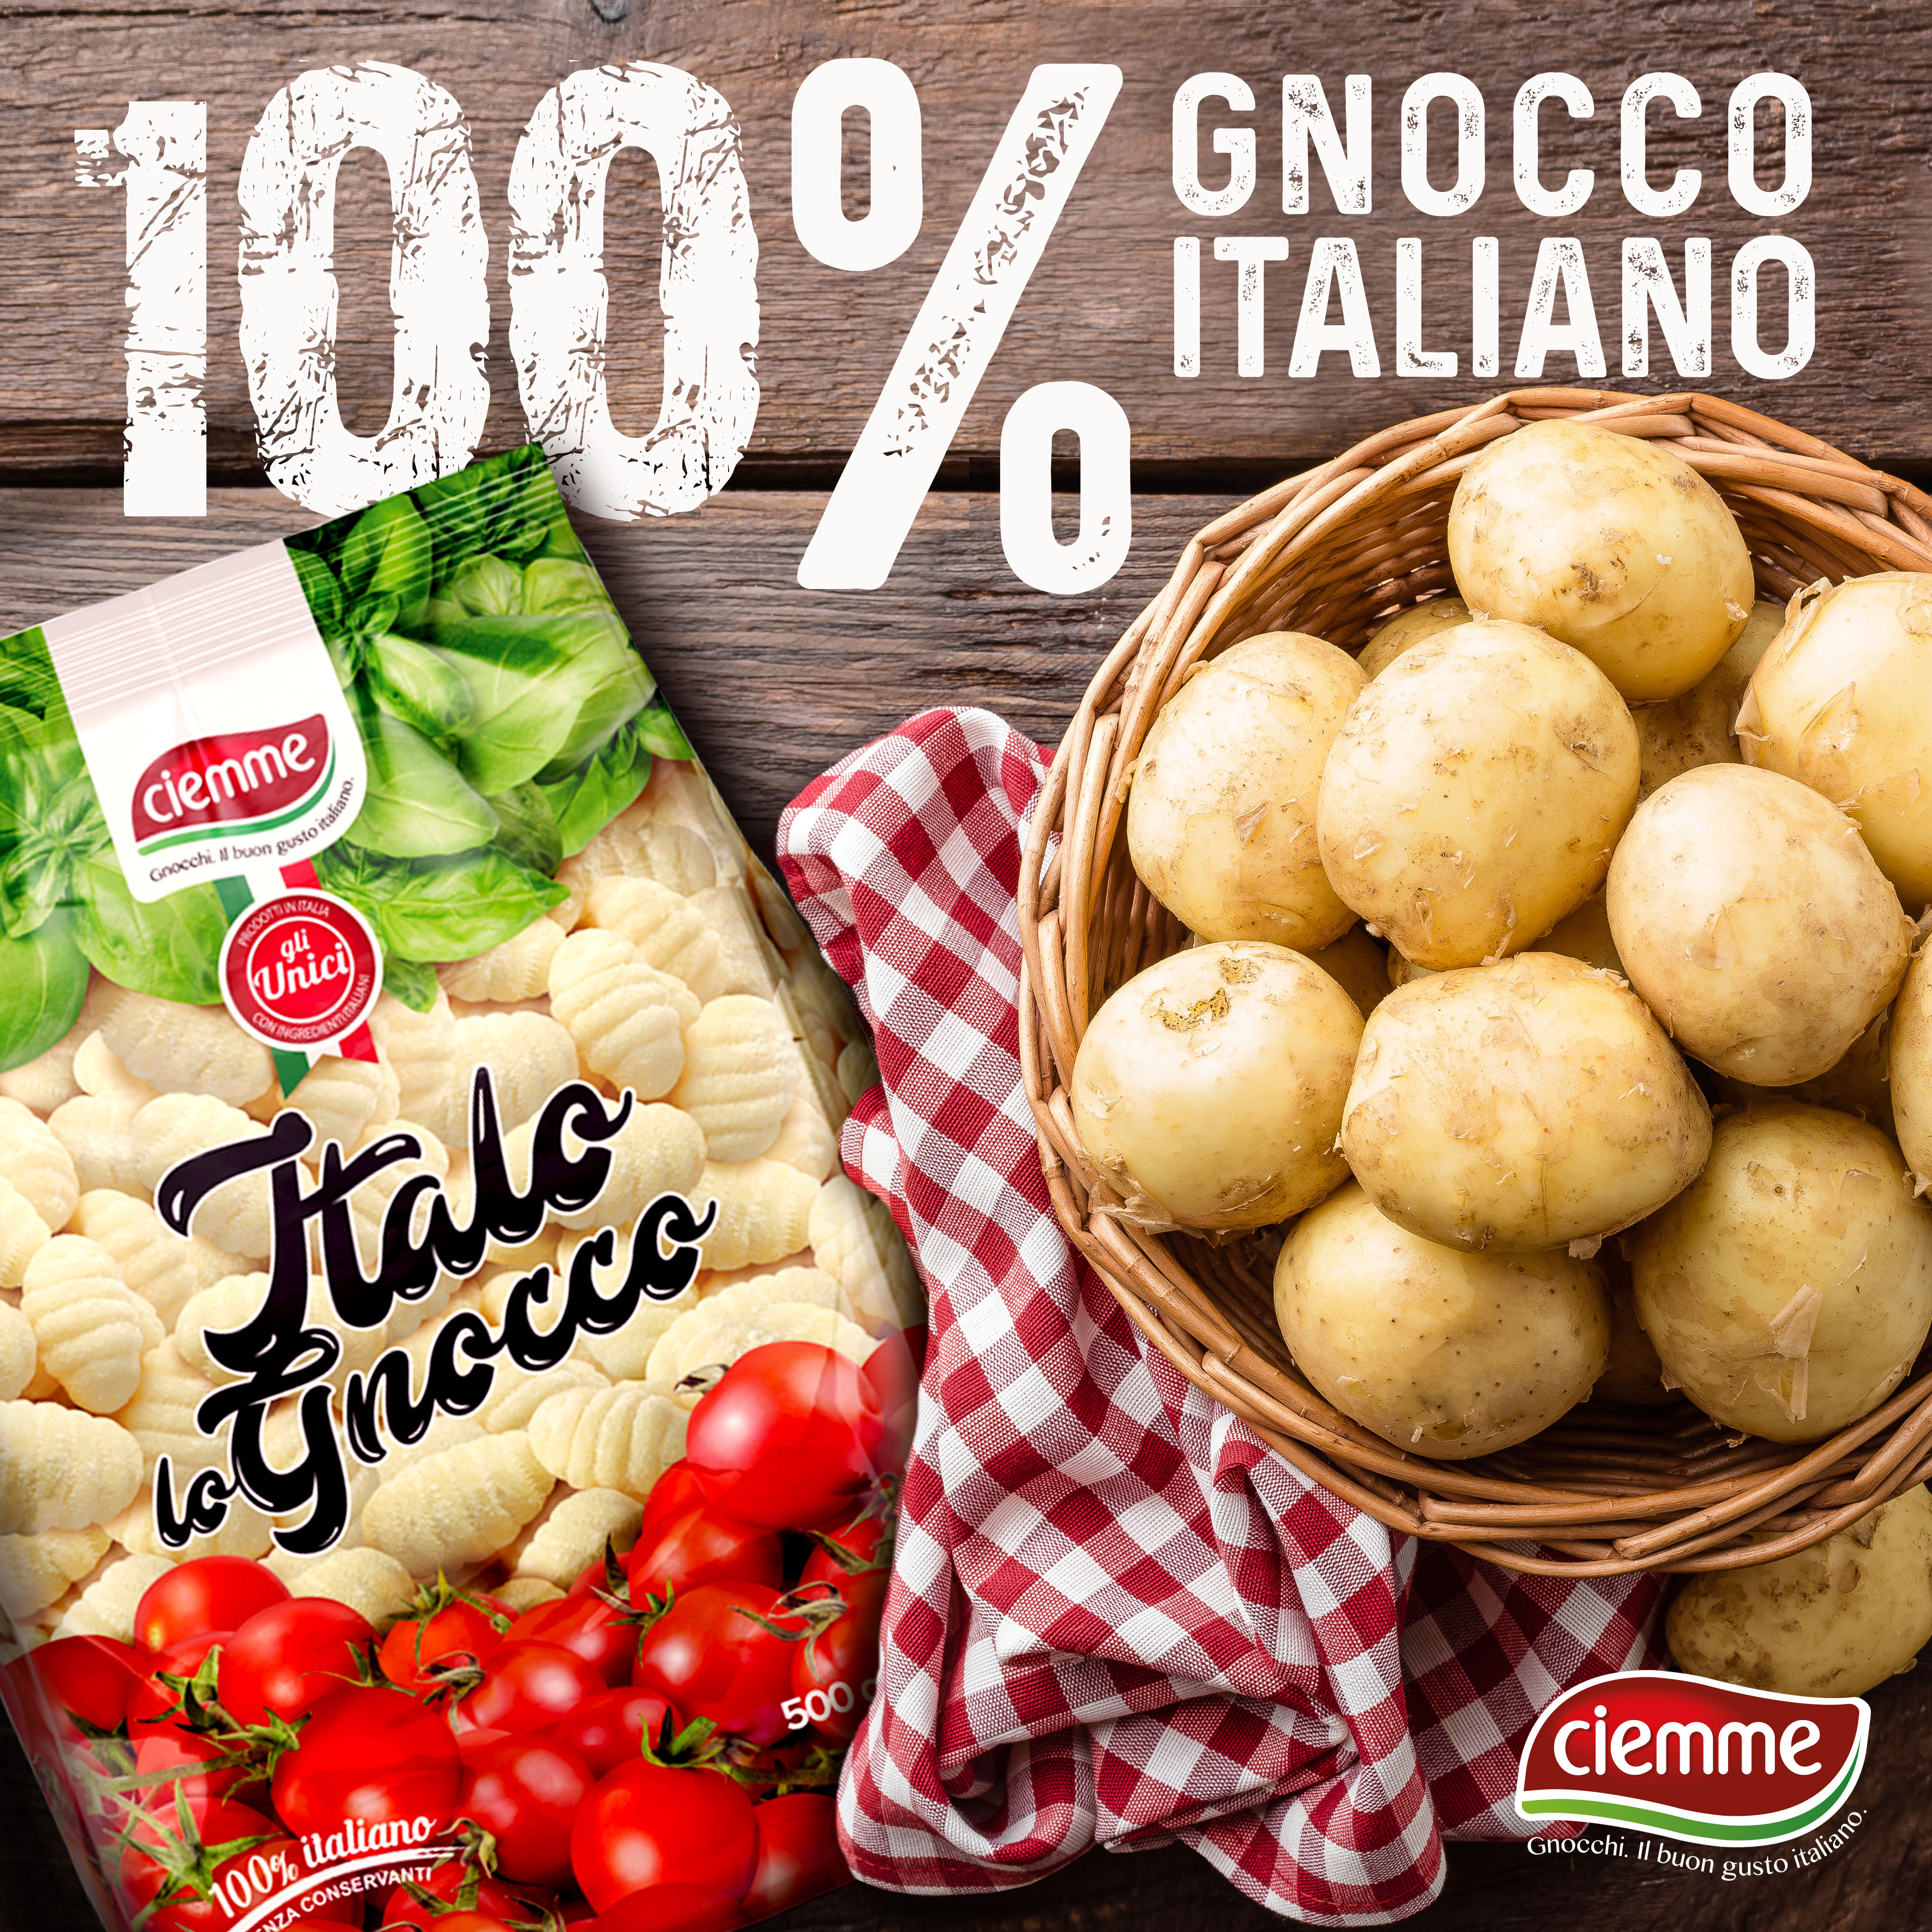 ITALO LO GNOCCO